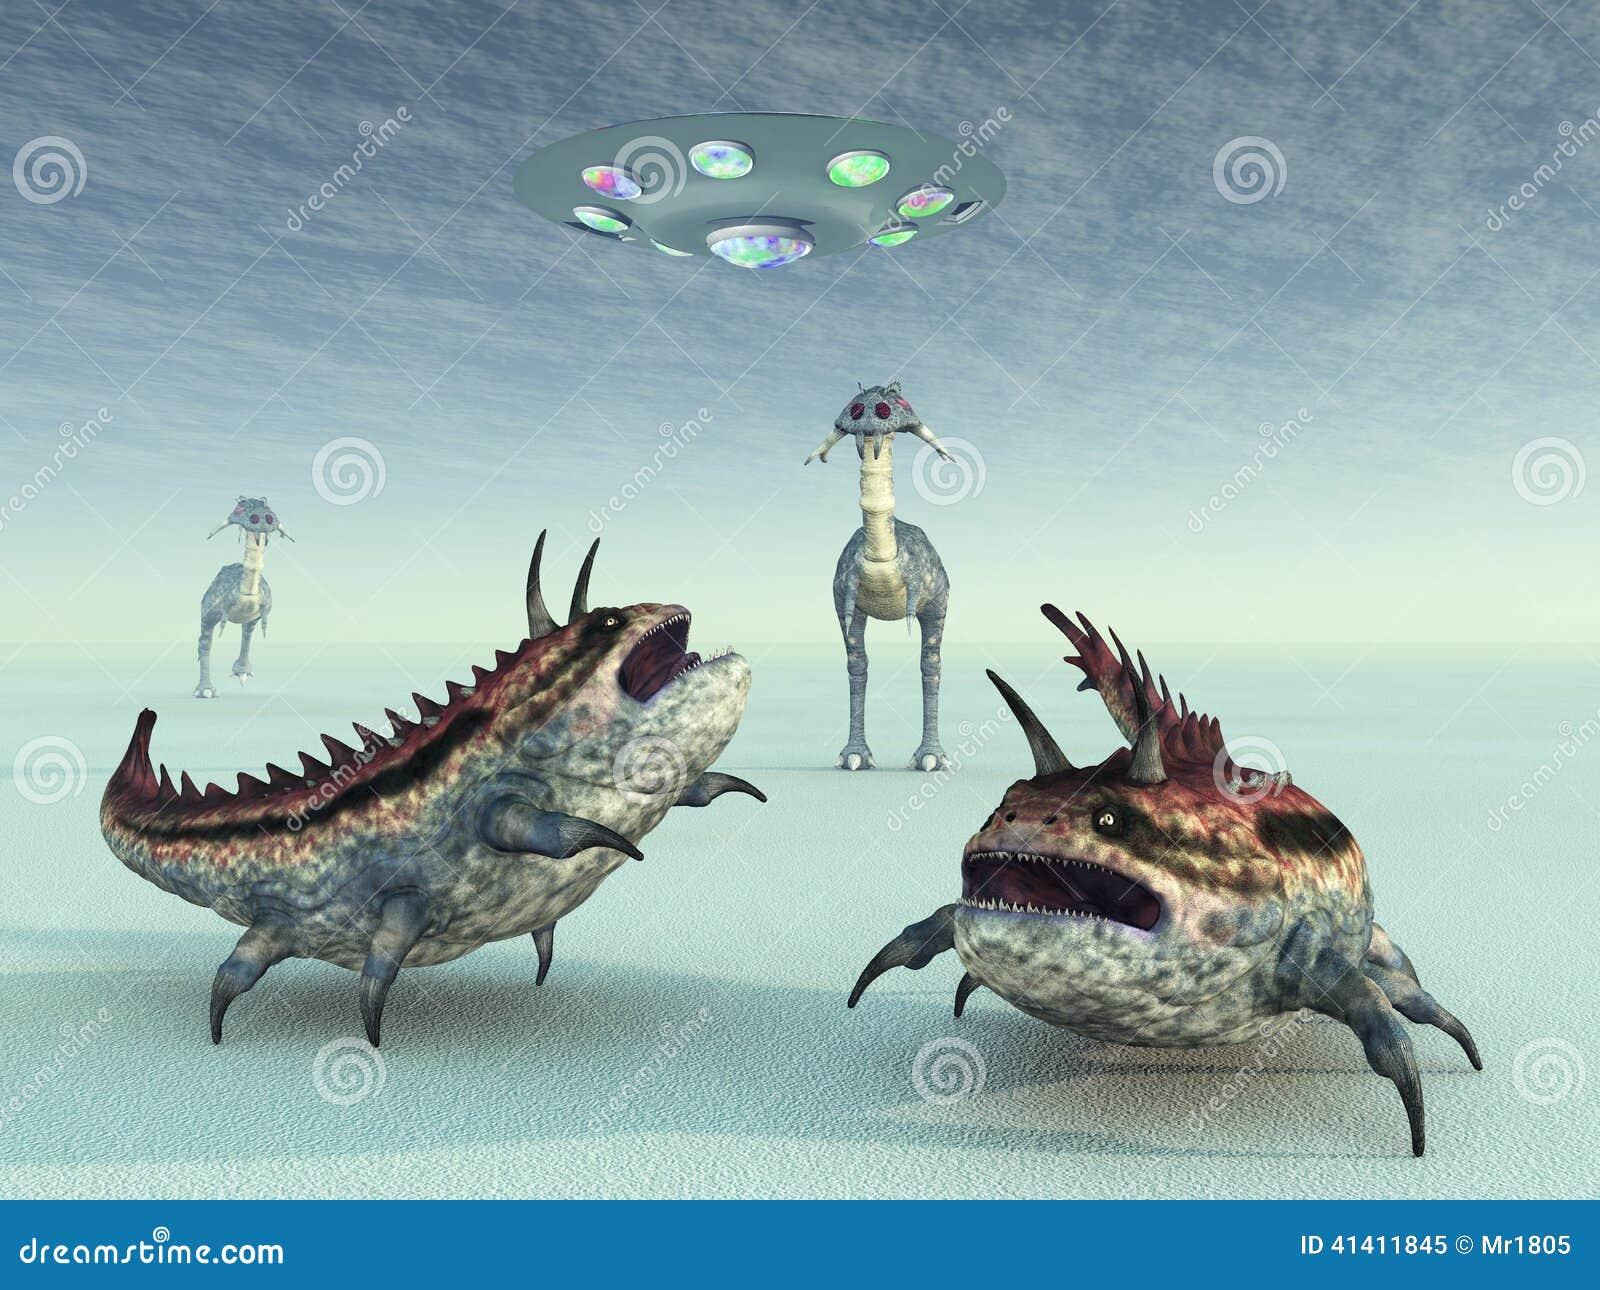 El hombrecito Extraterrestrial-life-computer-generated-d-illustration-another-planet-41411845